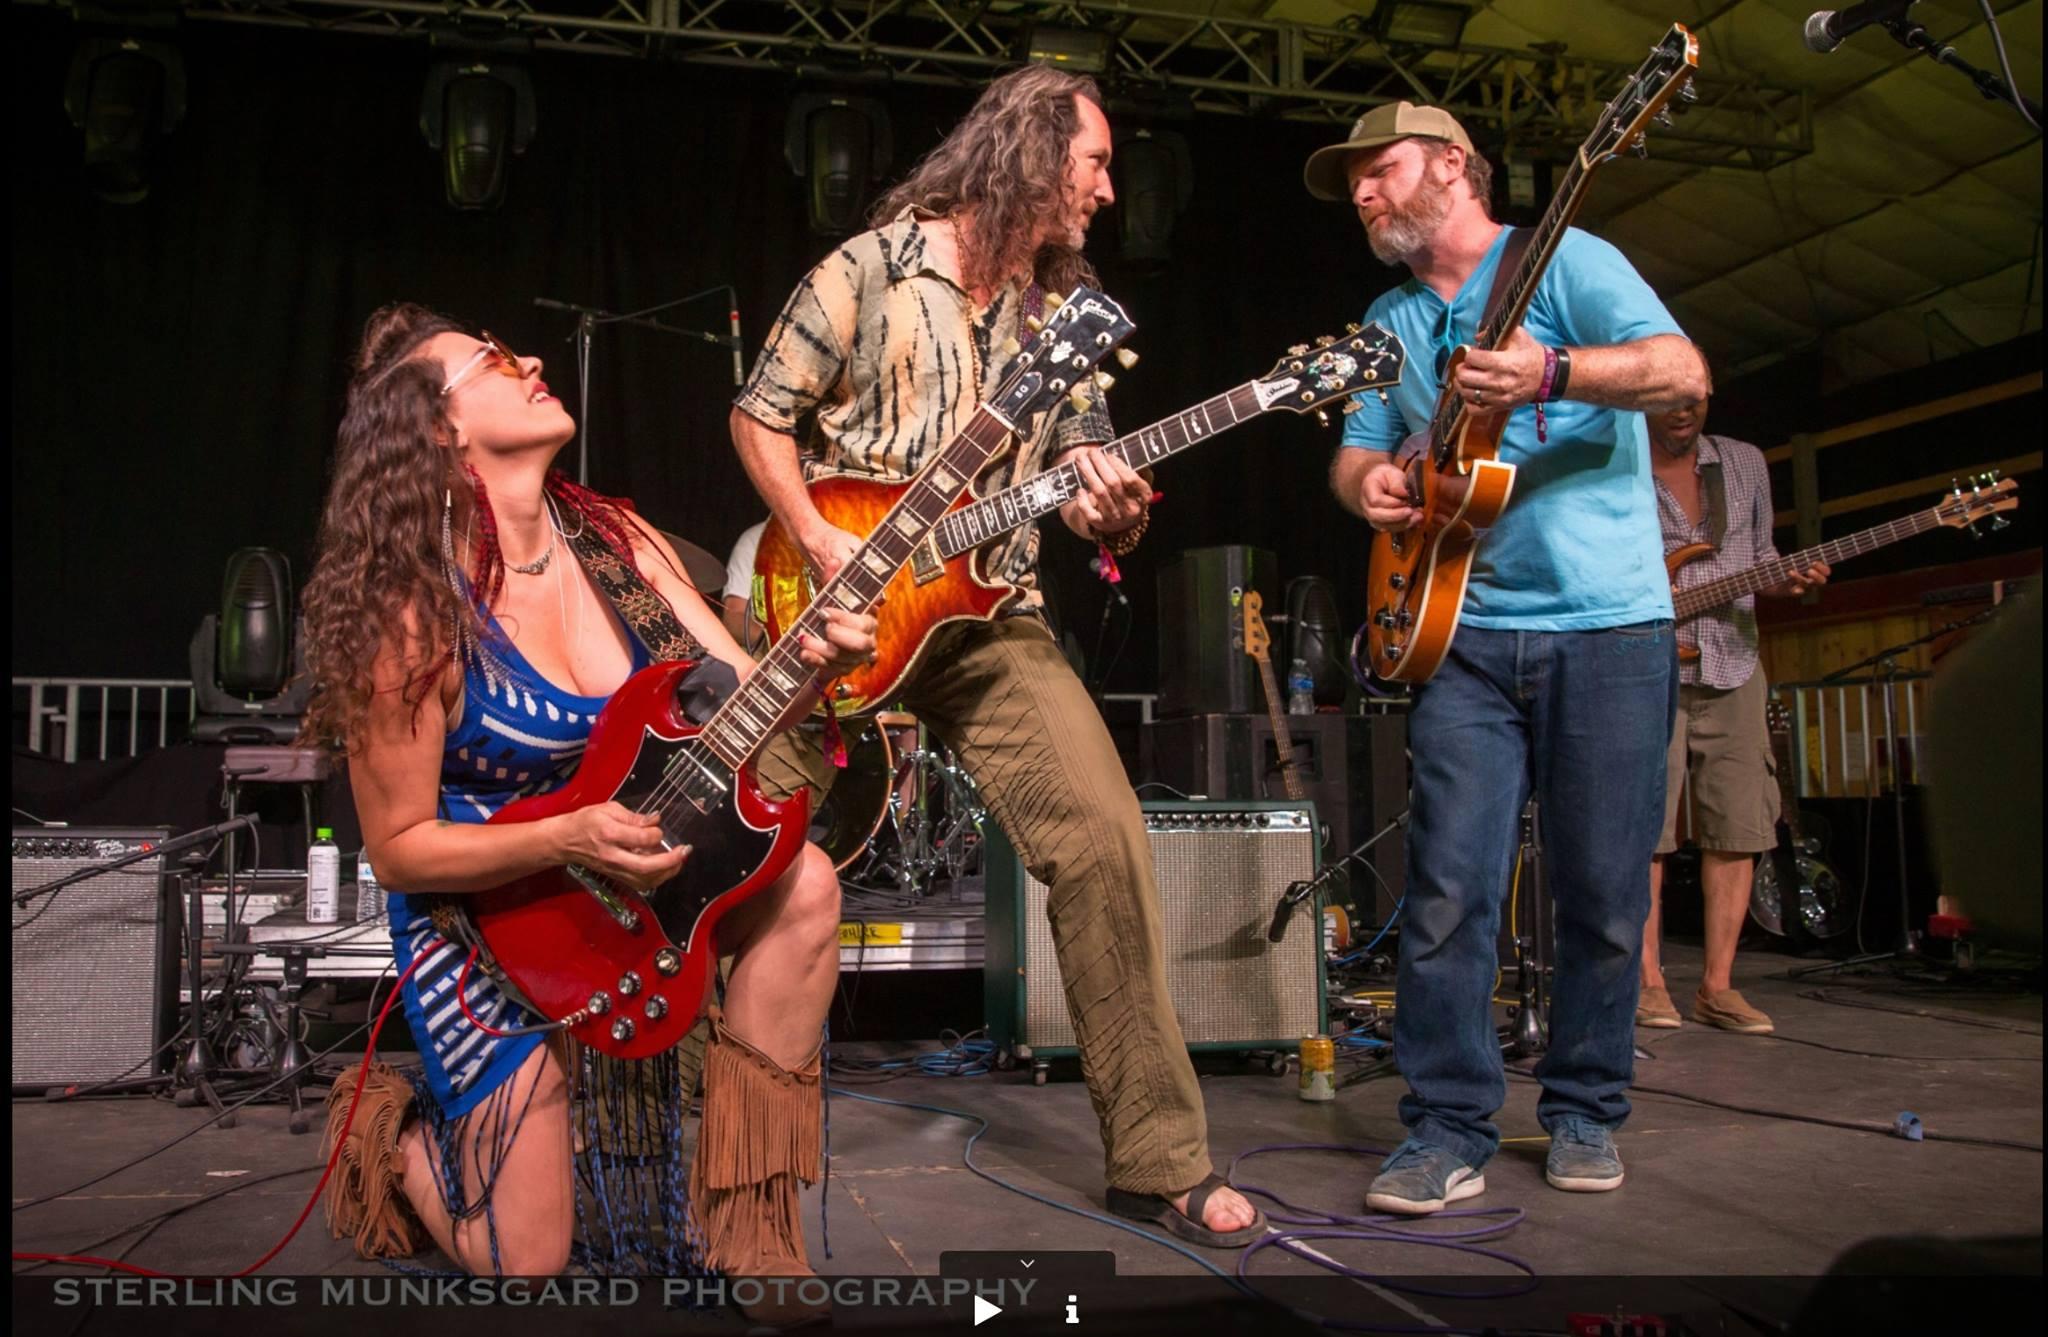 Pamela Parker & Sean Leahey, Guitarmageddon @ High Sierra Music Fest 2016